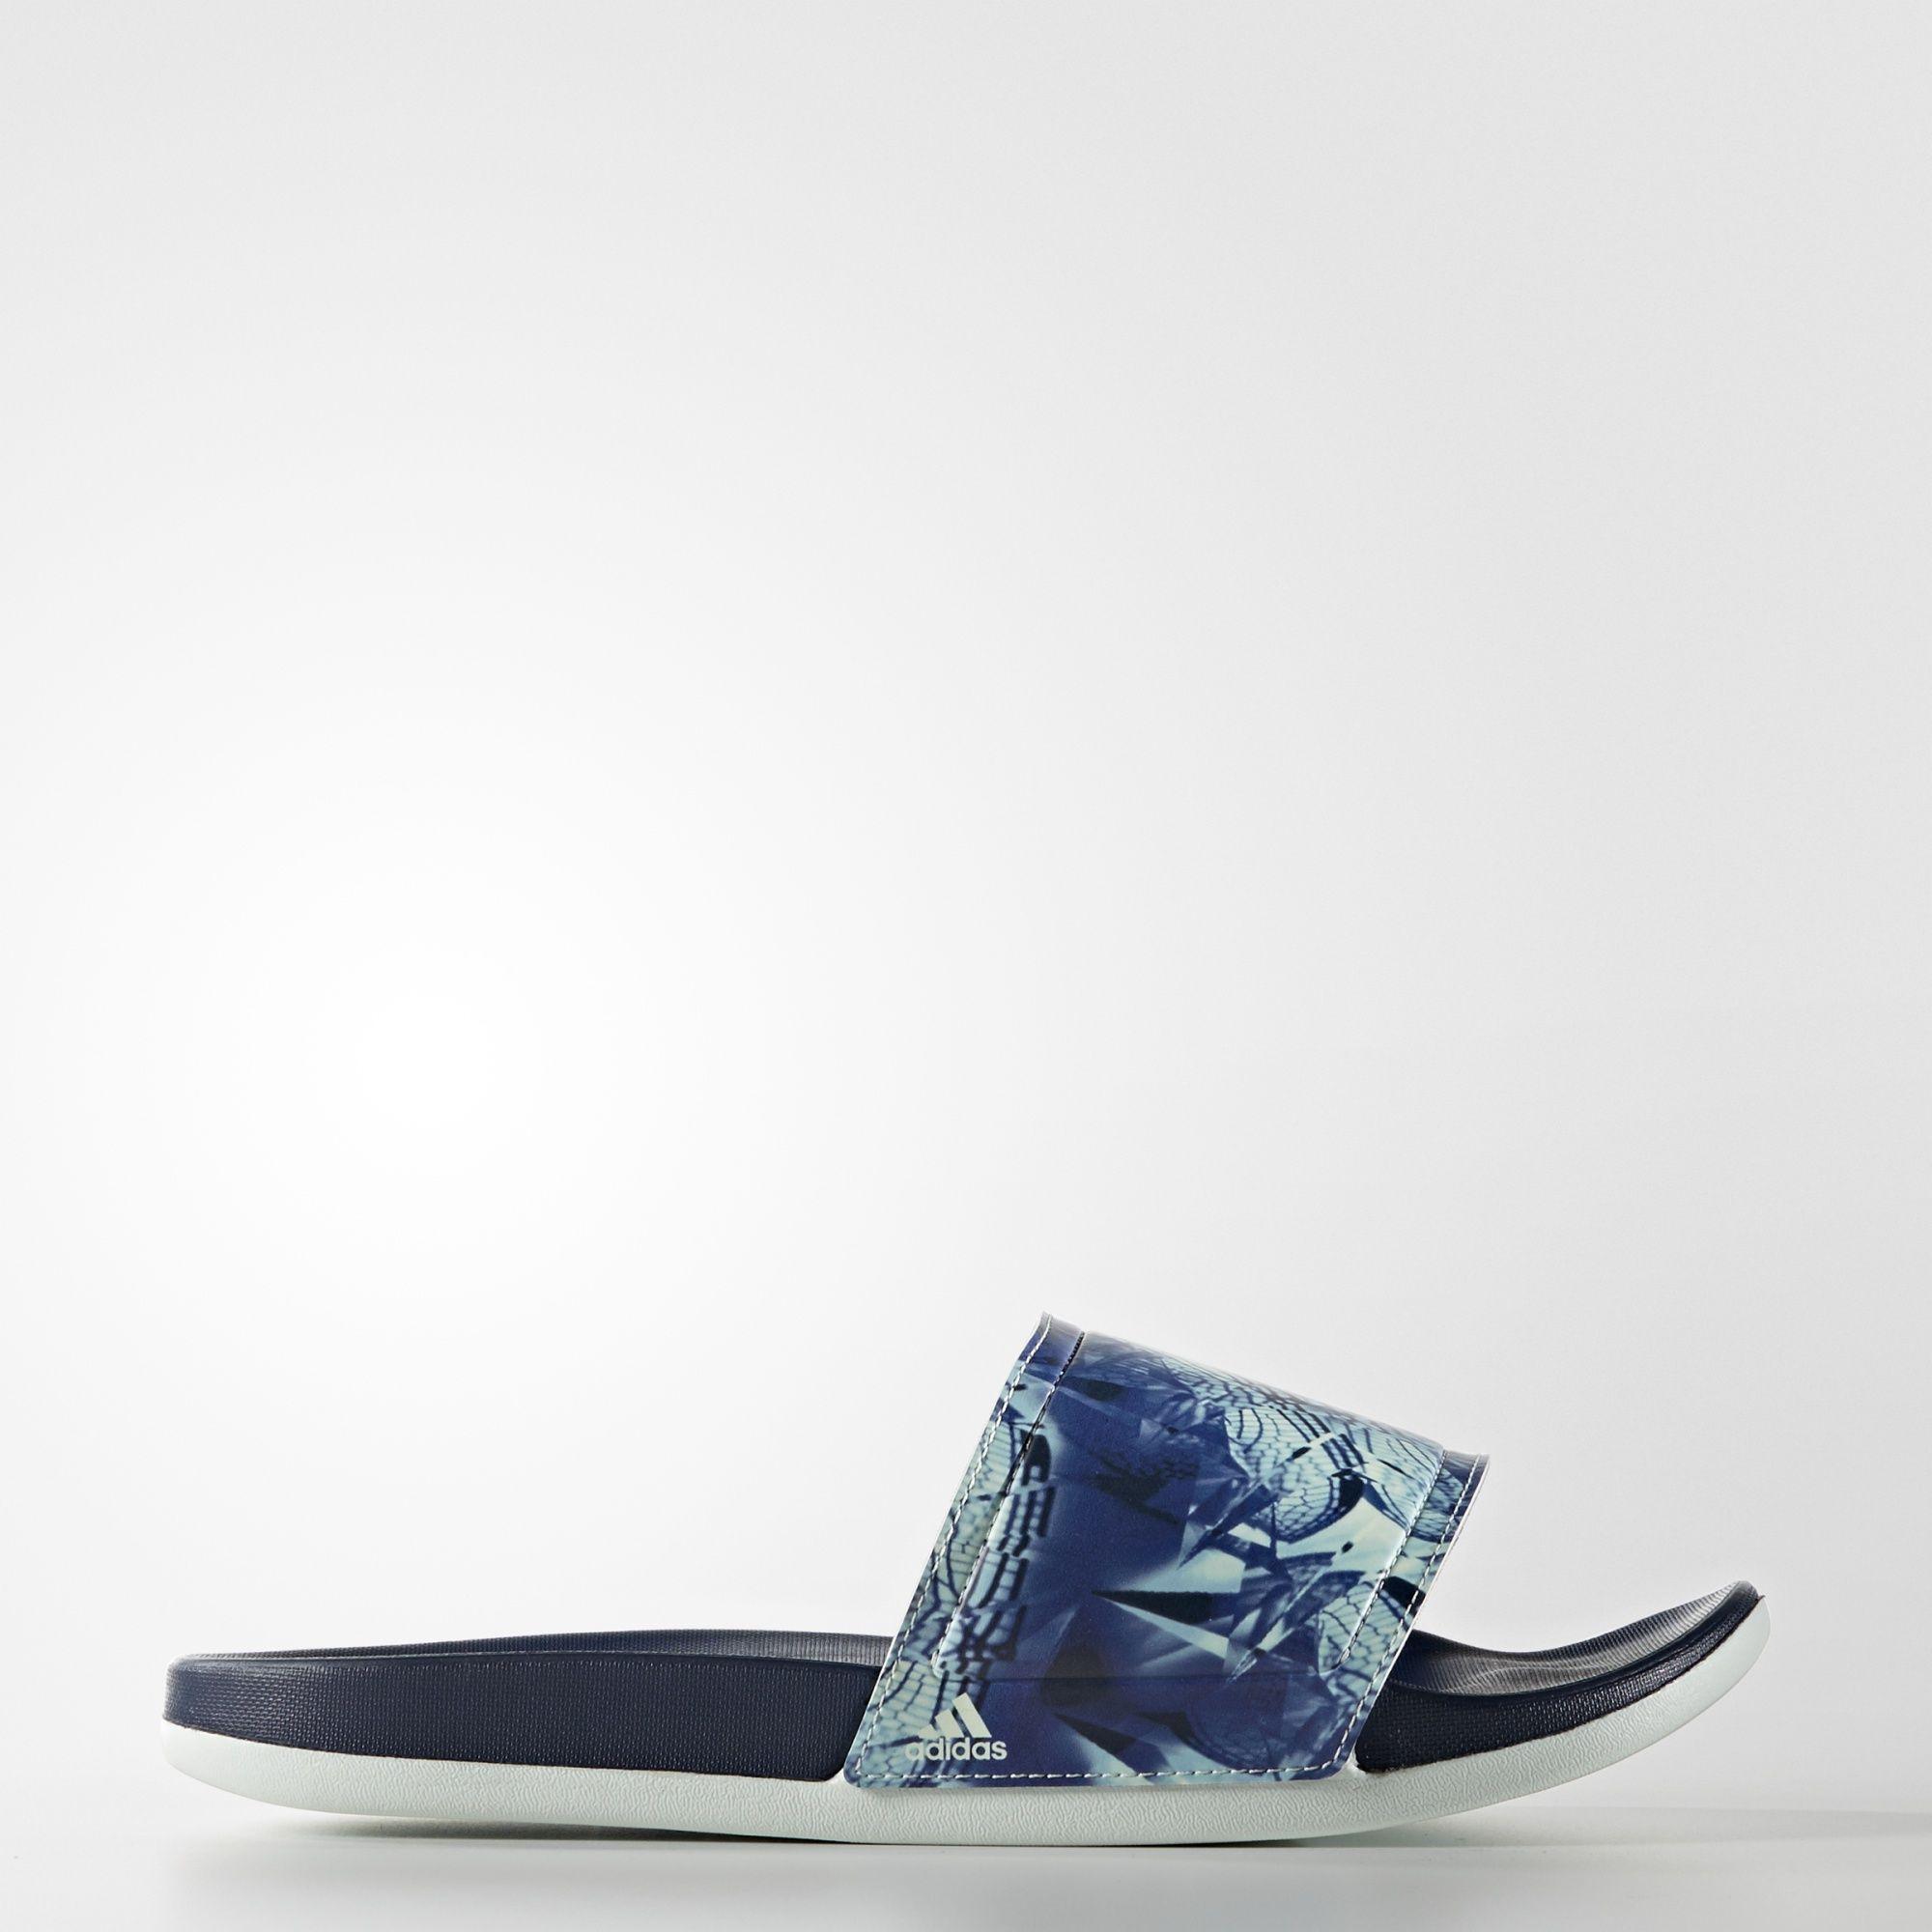 adidas adilette Cloudfoam Ultra Slides  Blue   adidas US